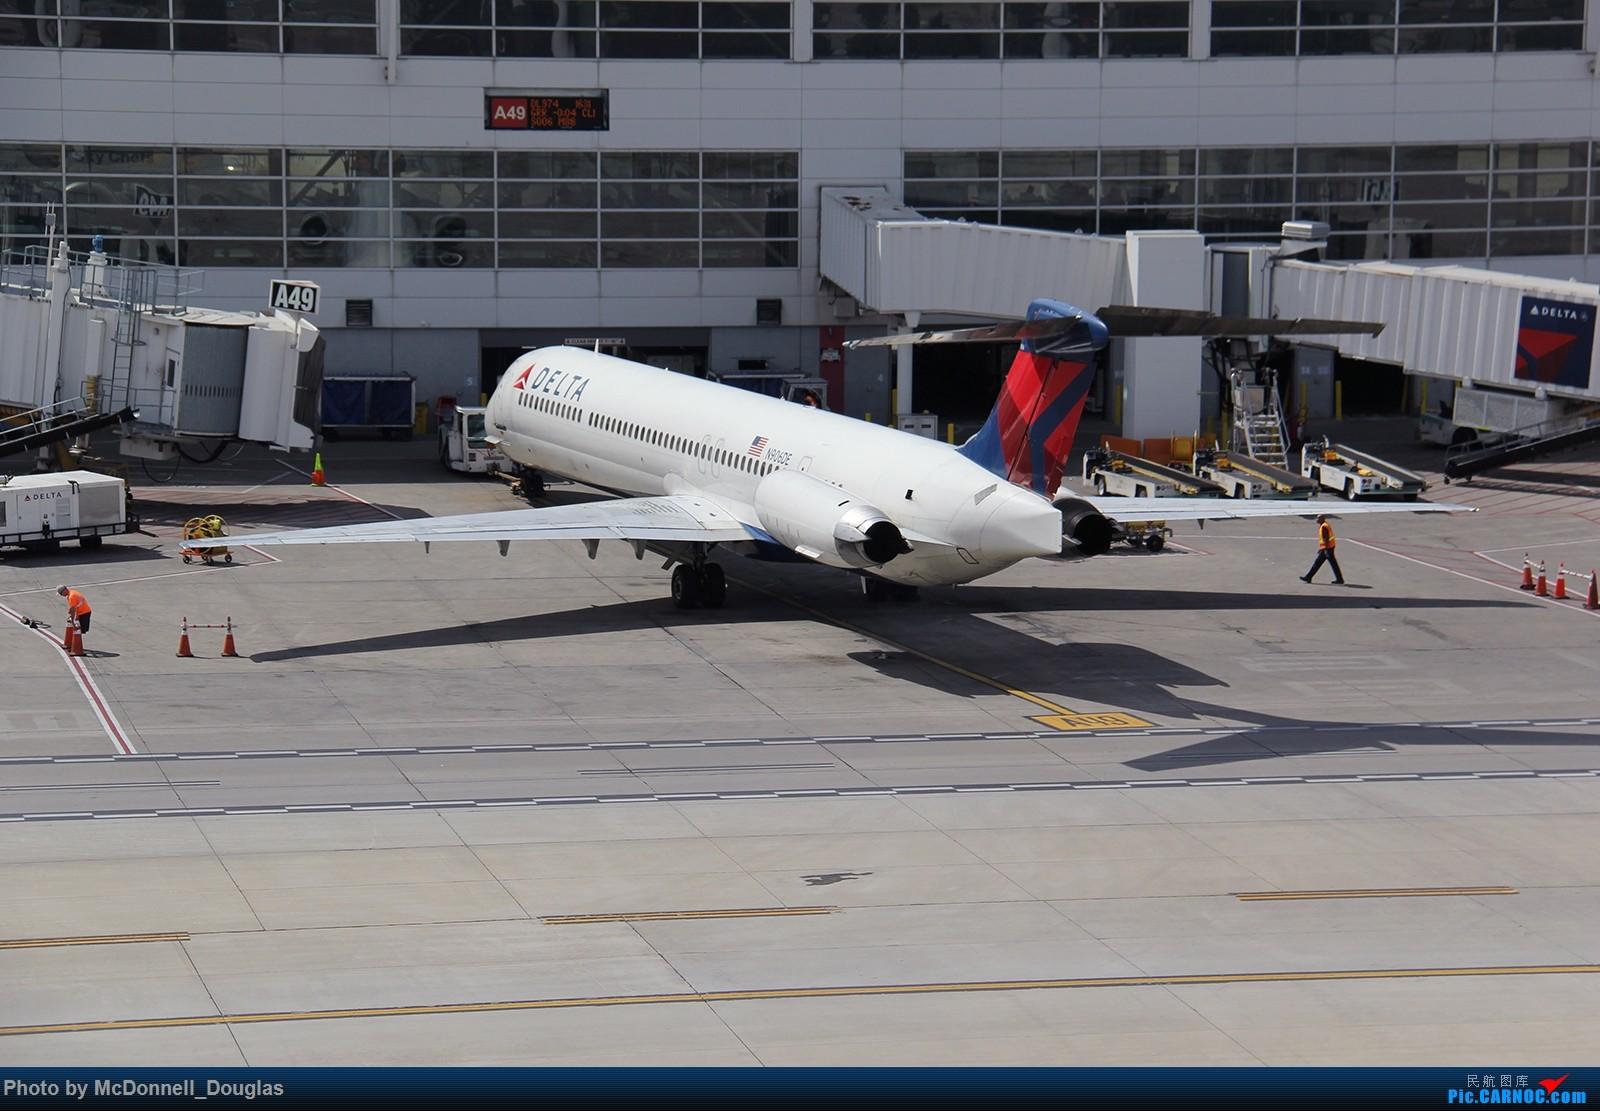 Re:[原创]【上海飞友会】图会很多,也有很多驾驶舱,杂七杂八的美帝,梦寐以求的圣马丁,这更绝不弃贴,前十个id砸飞机砸一个返一个【驾驶舱已出现】 MCDONNELL DOUGLAS MD-90-30 N906DA 美国底特律都会韦恩郡机场